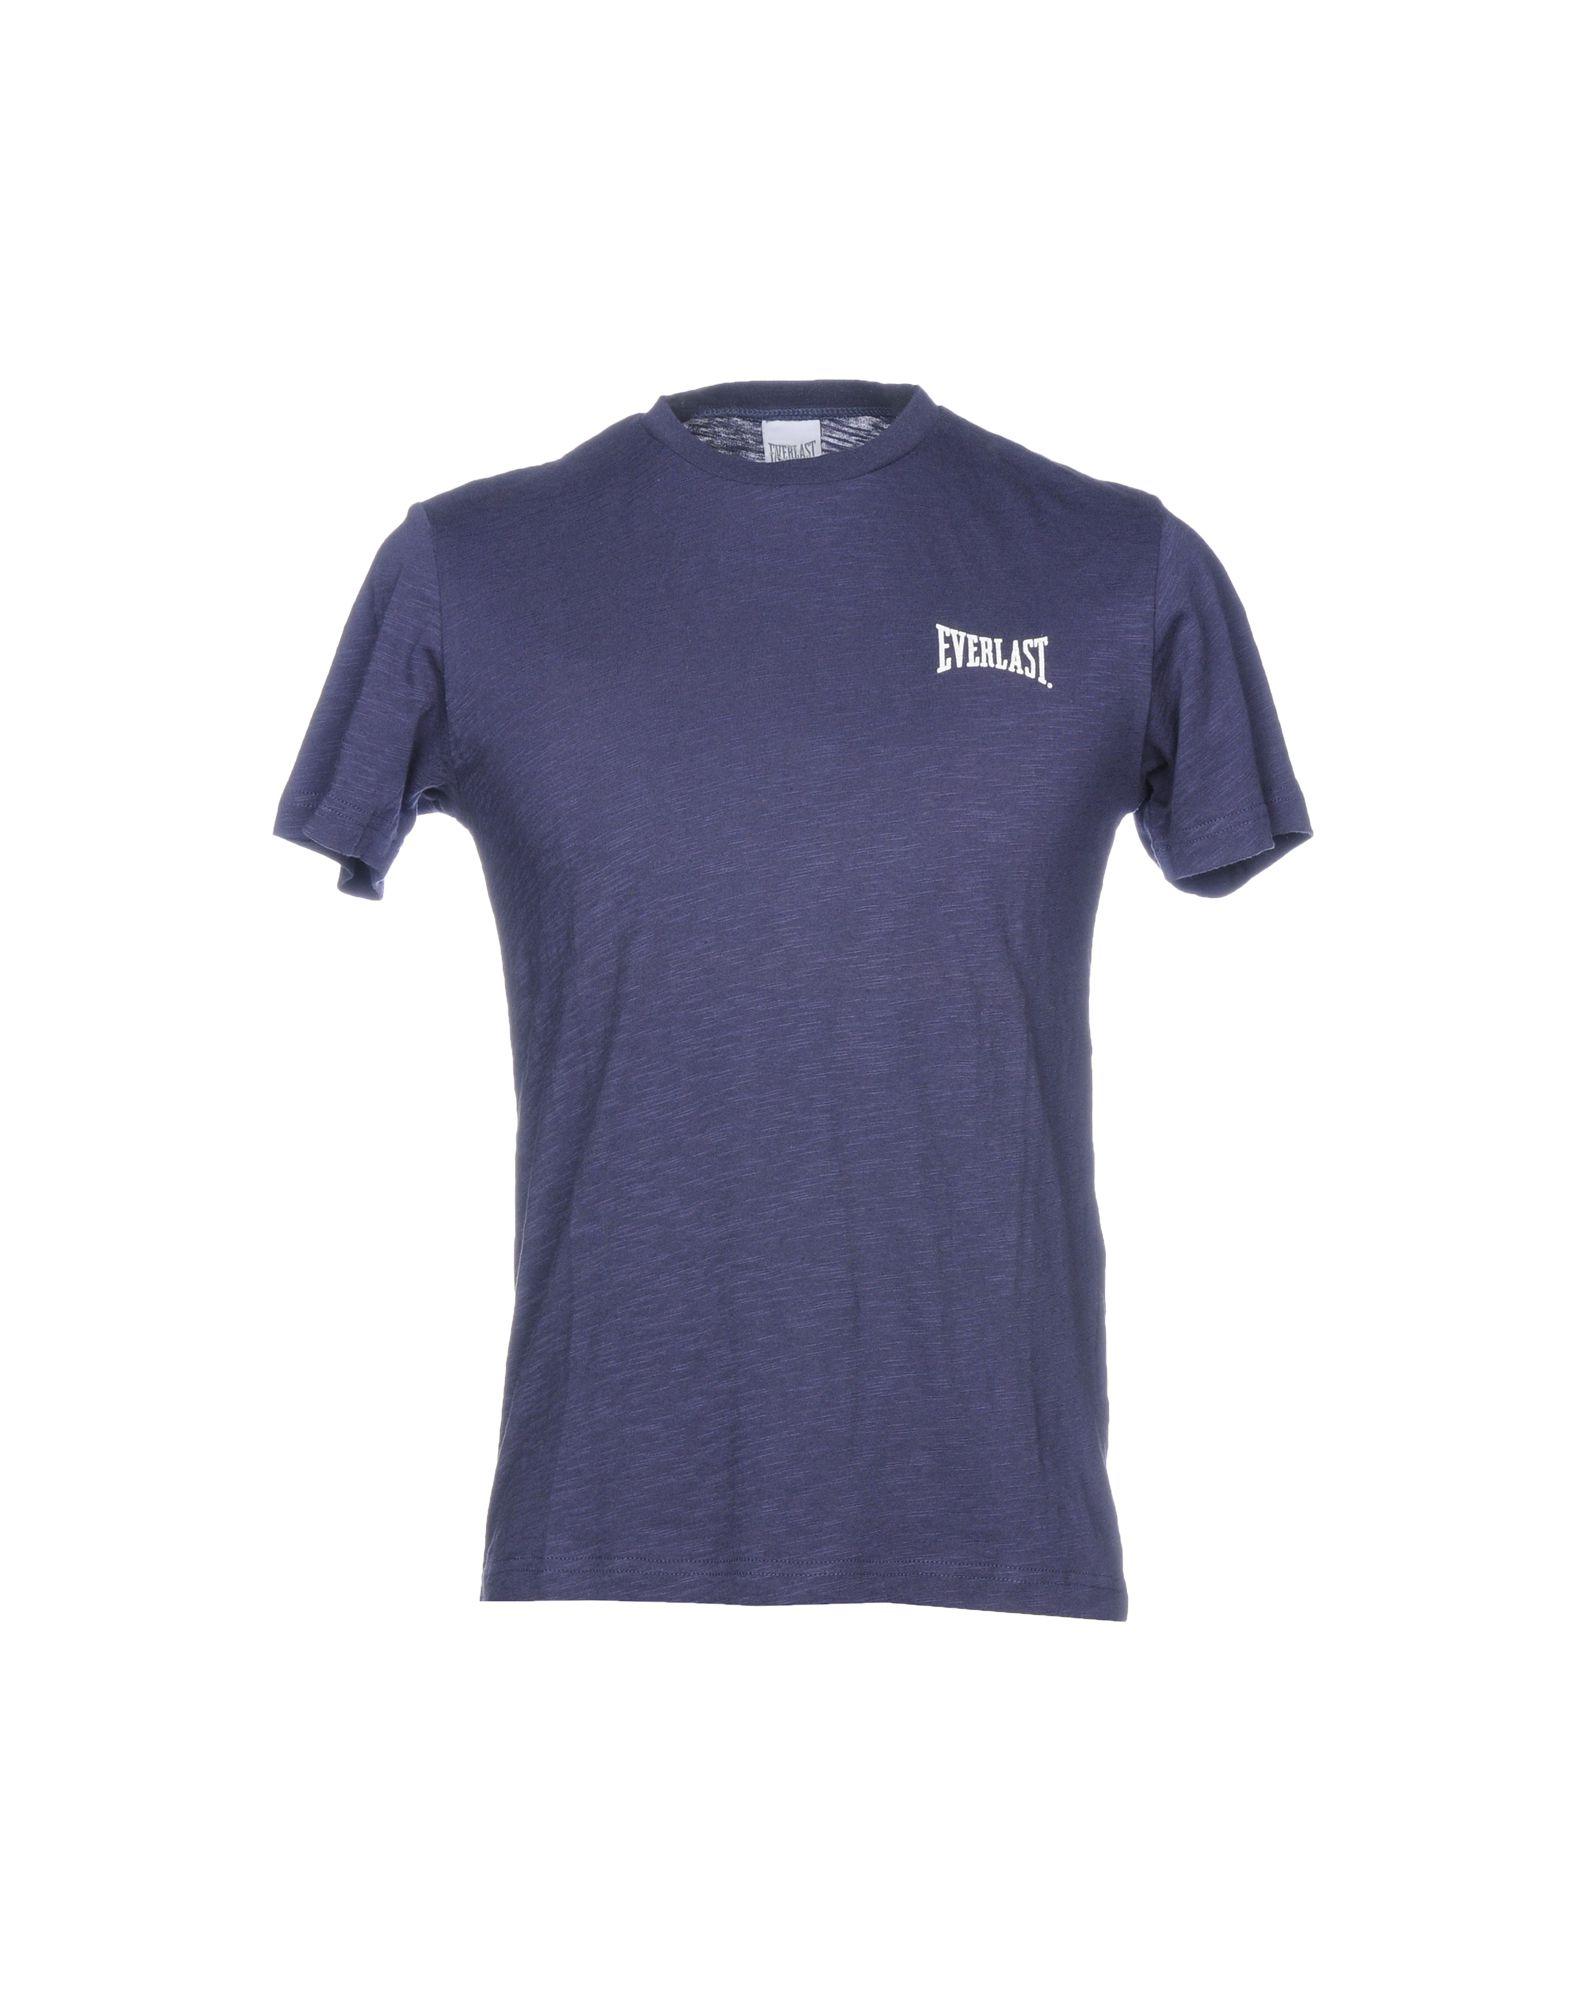 A buon T-Shirt mercato A buon mercato T-Shirt buon Everlast Uomo - 12194117QO 5c7a7f